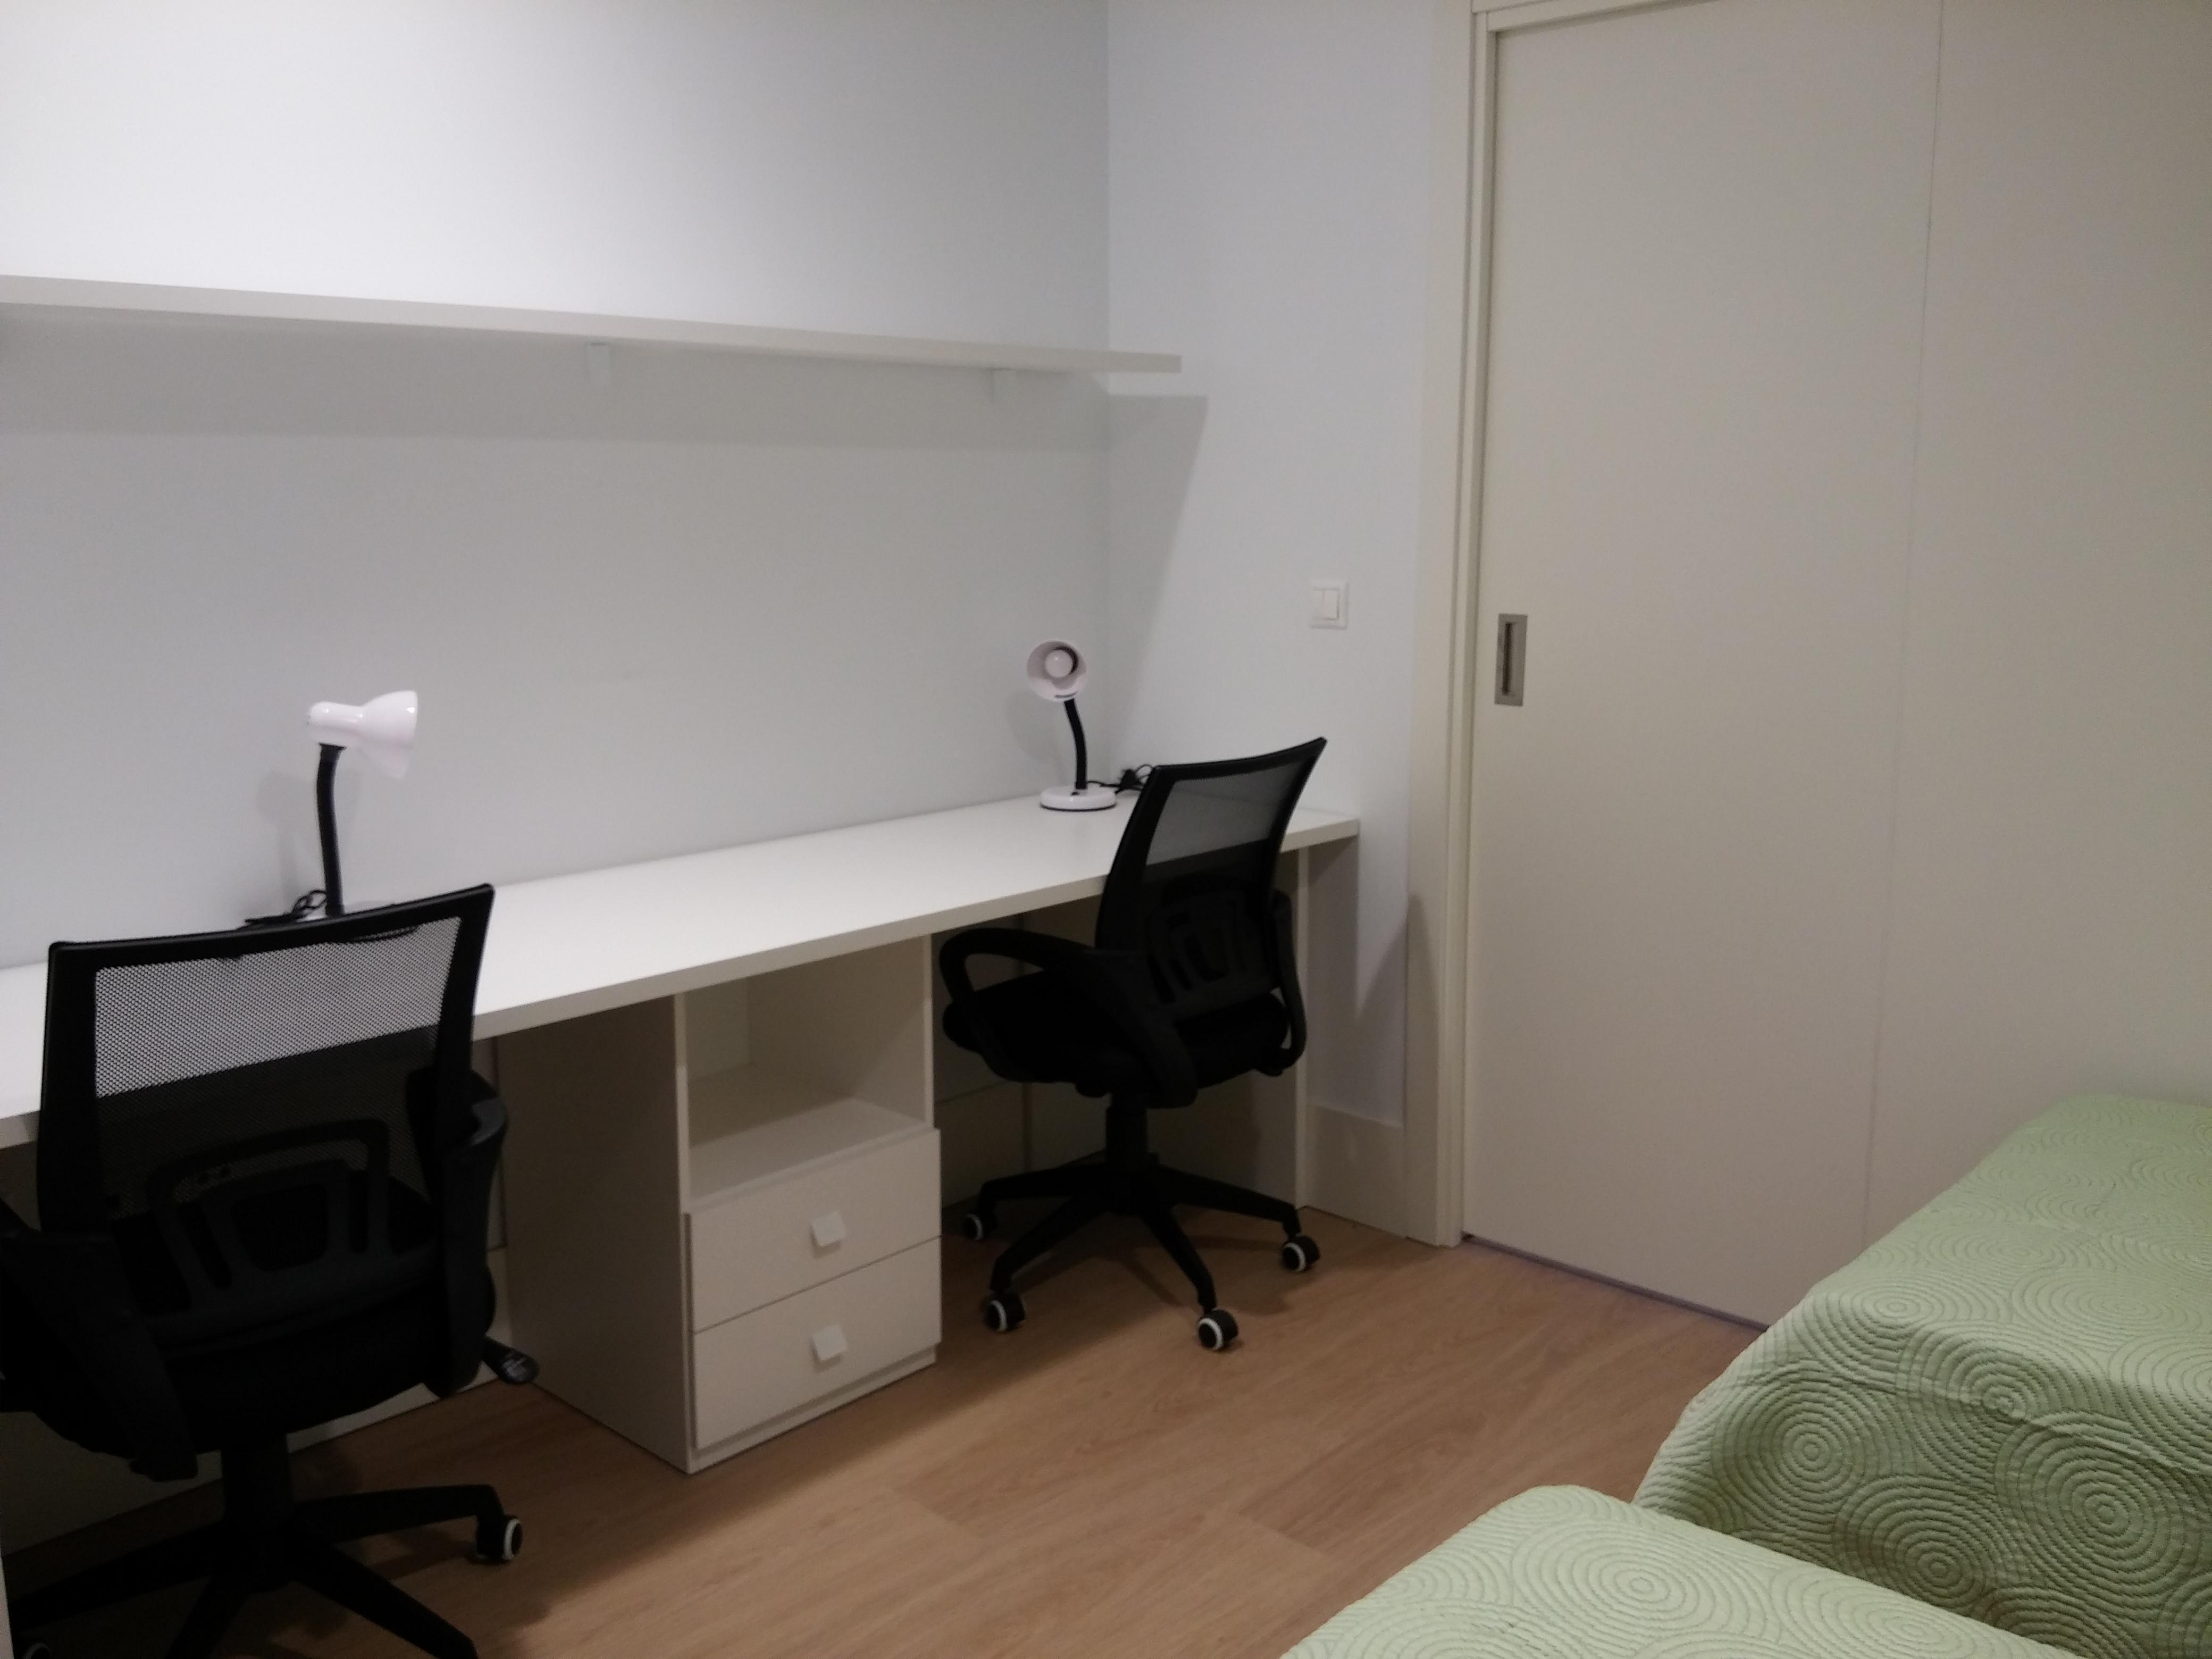 Apartamento Doble - Dormitorio